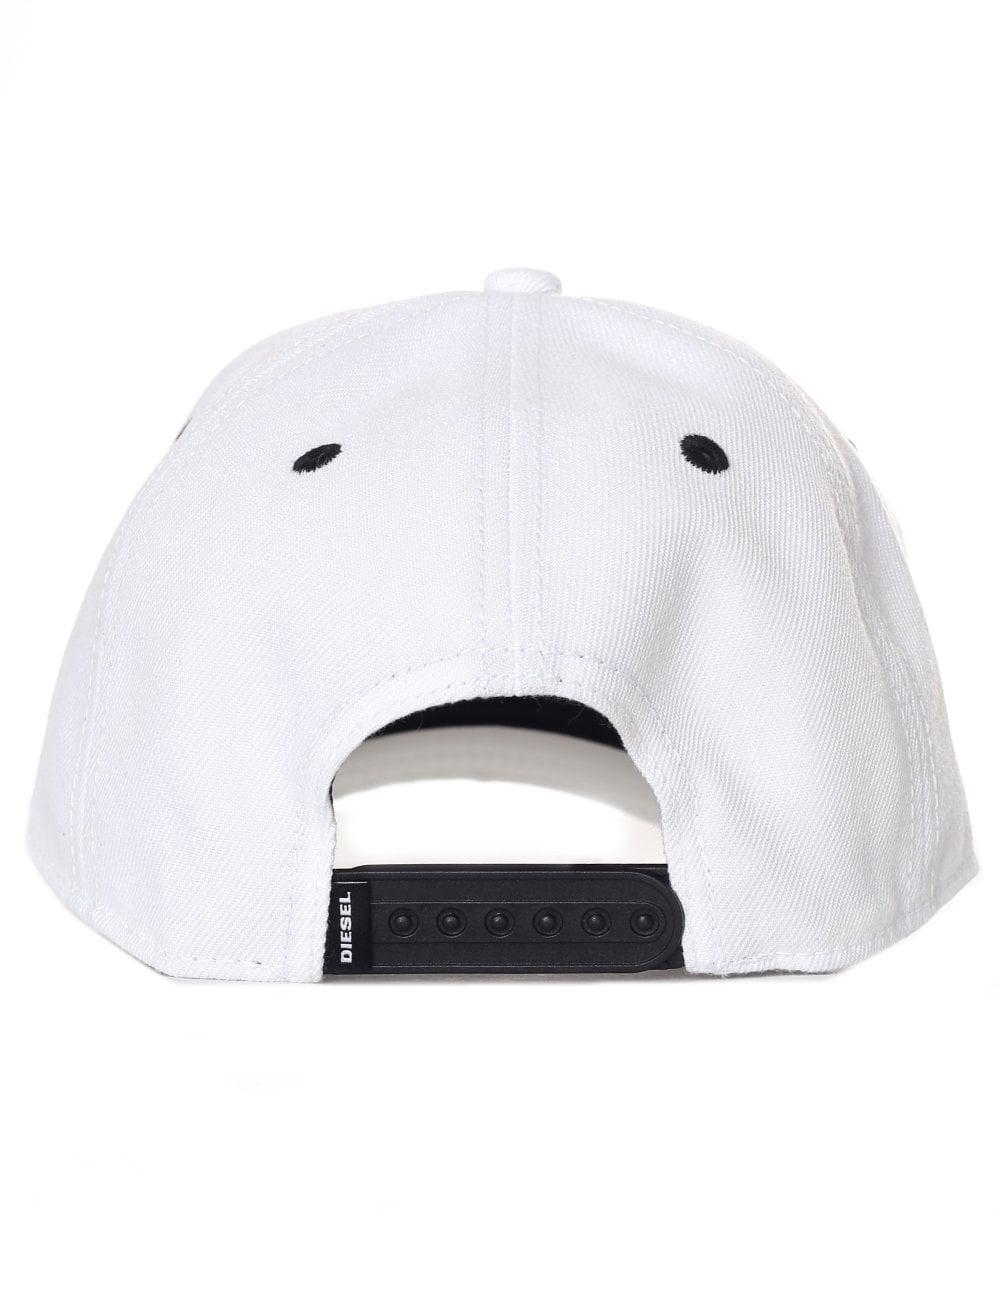 7fc19350620c6 ... promo code for rvca mens finley snapback hat black heather one size  mahwprfl 1e401 3cd9e